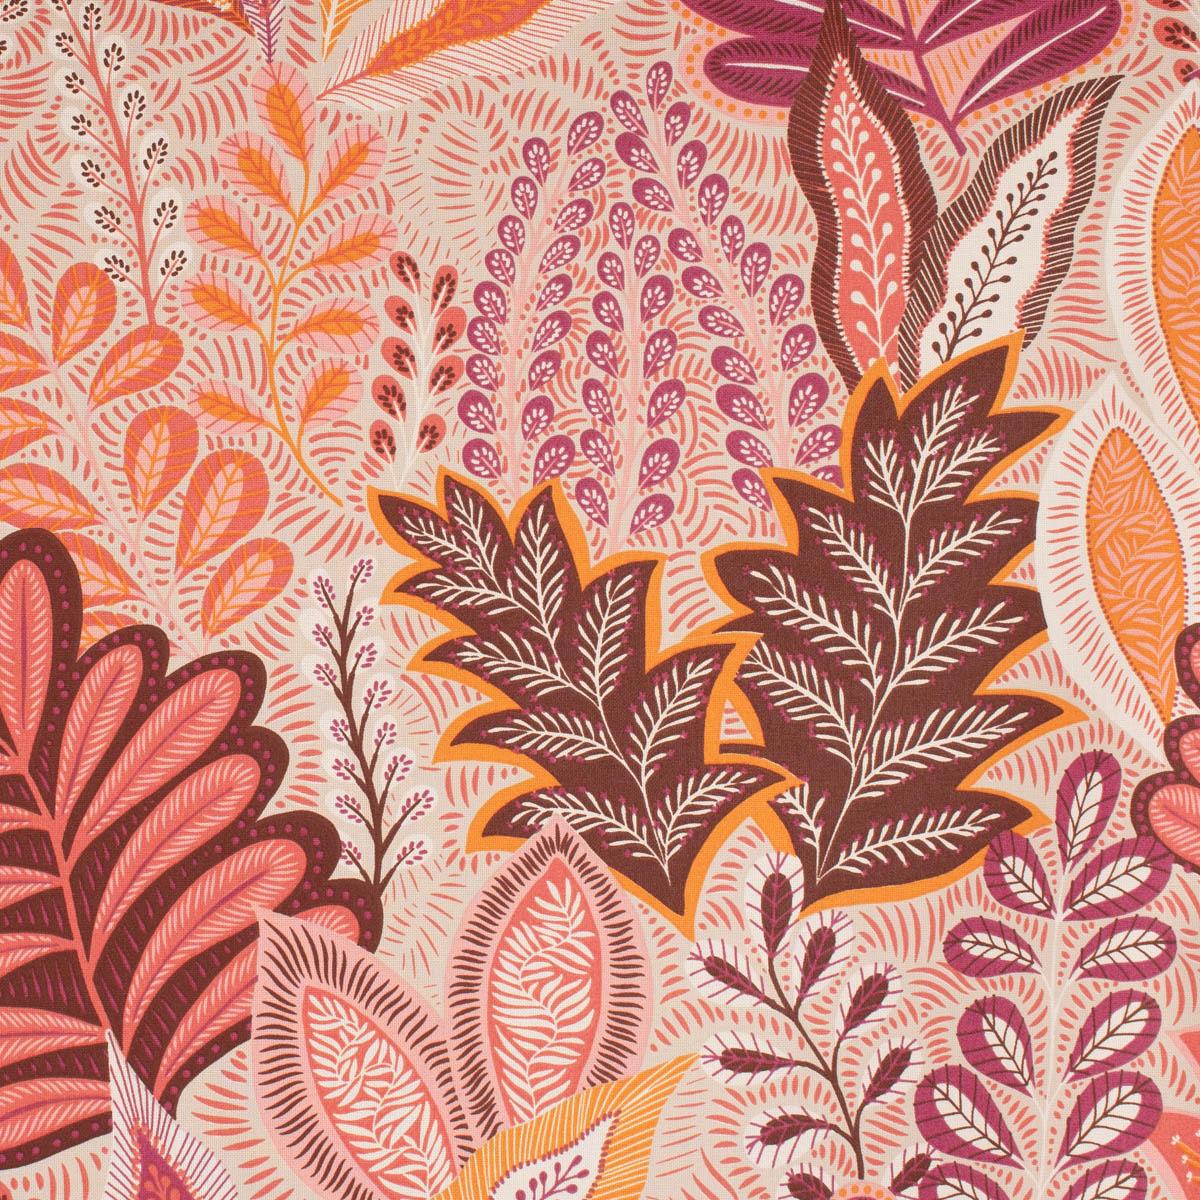 Dekostoff Halbpanama Leinenlook Botanic Arty Blätter pink orange natur 1,40m Breite